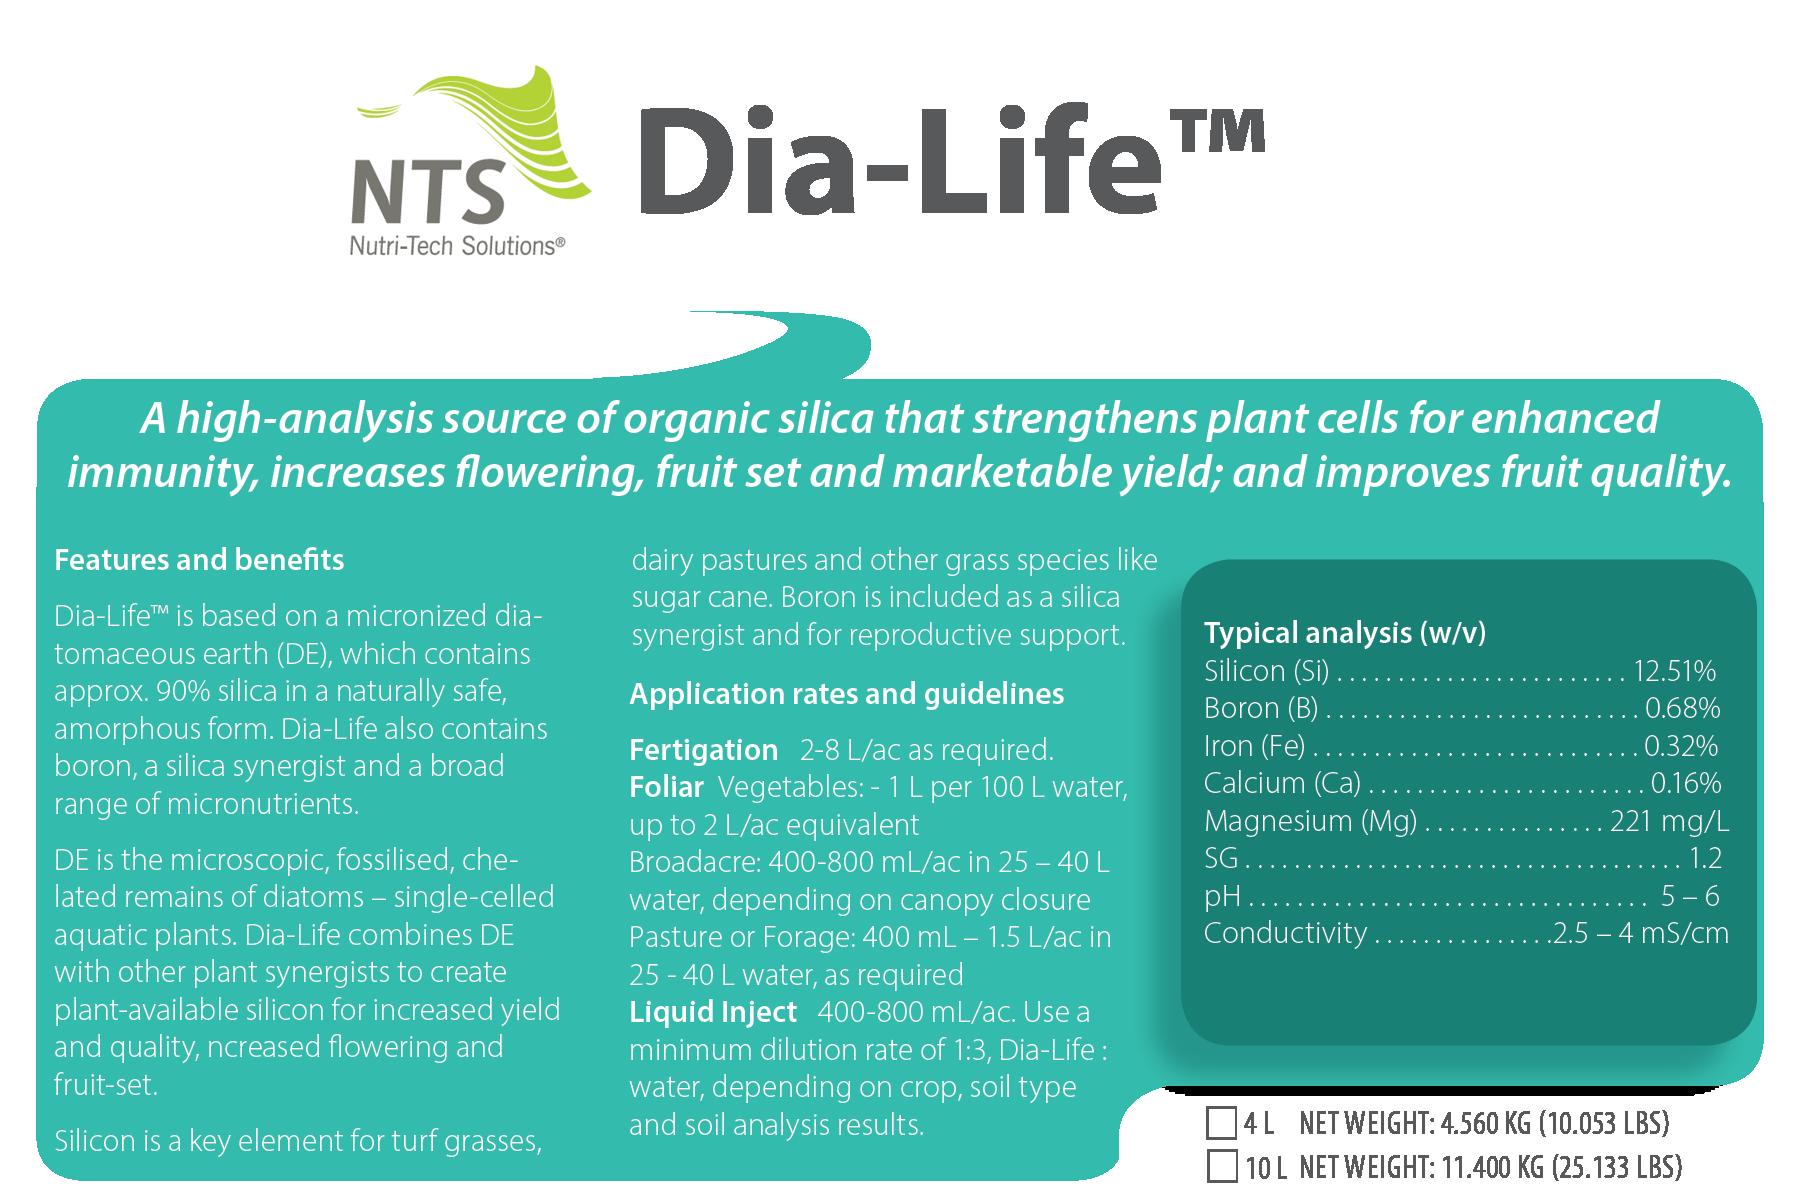 NTS Dia-Life™